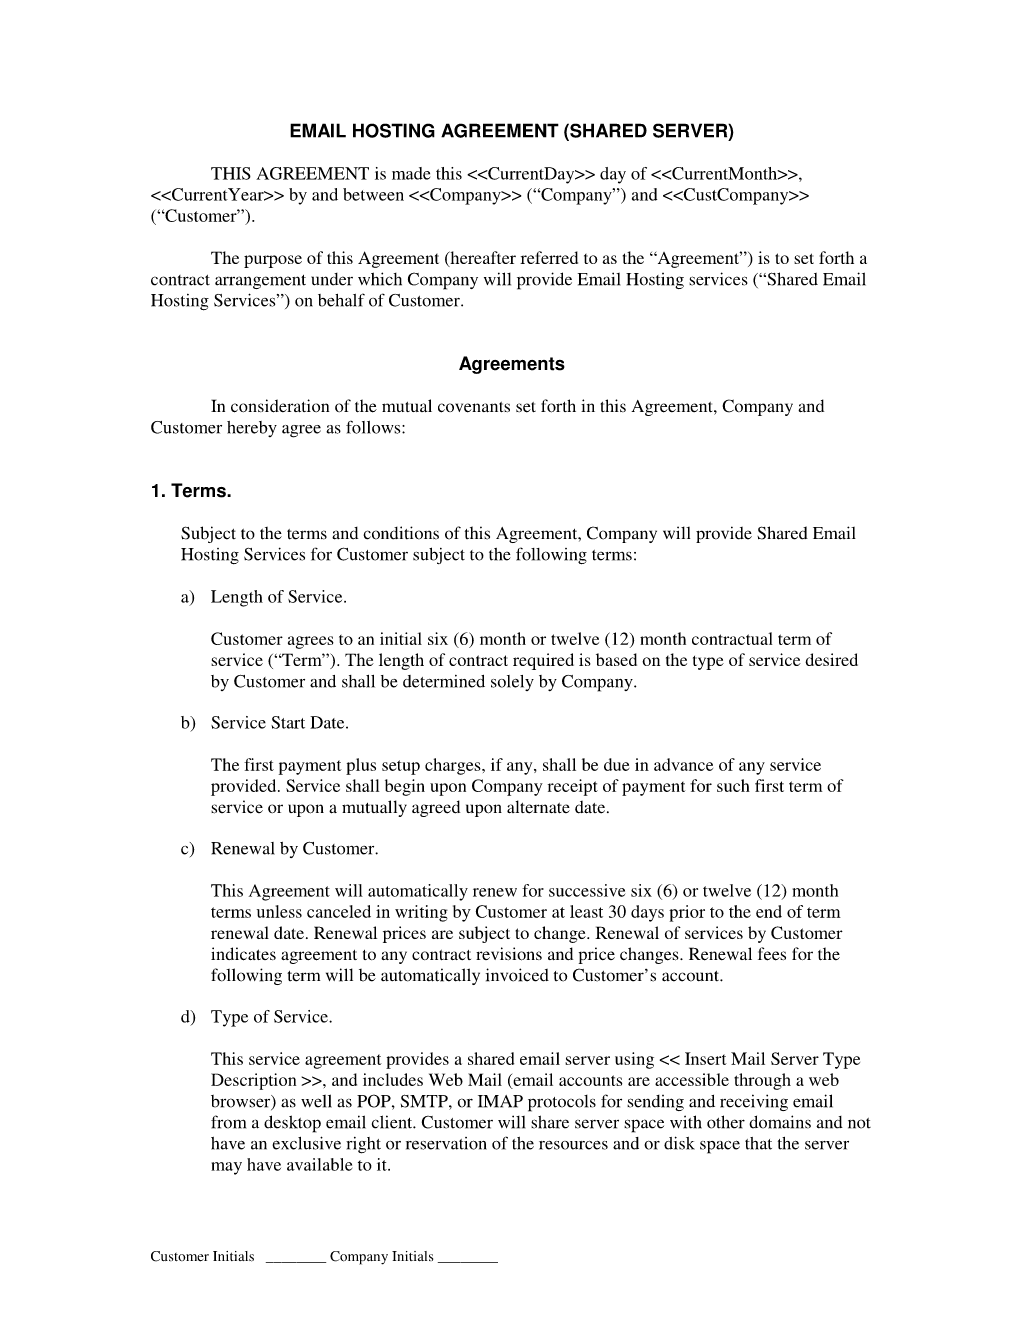 Web Development Service Level Agreement Template 28